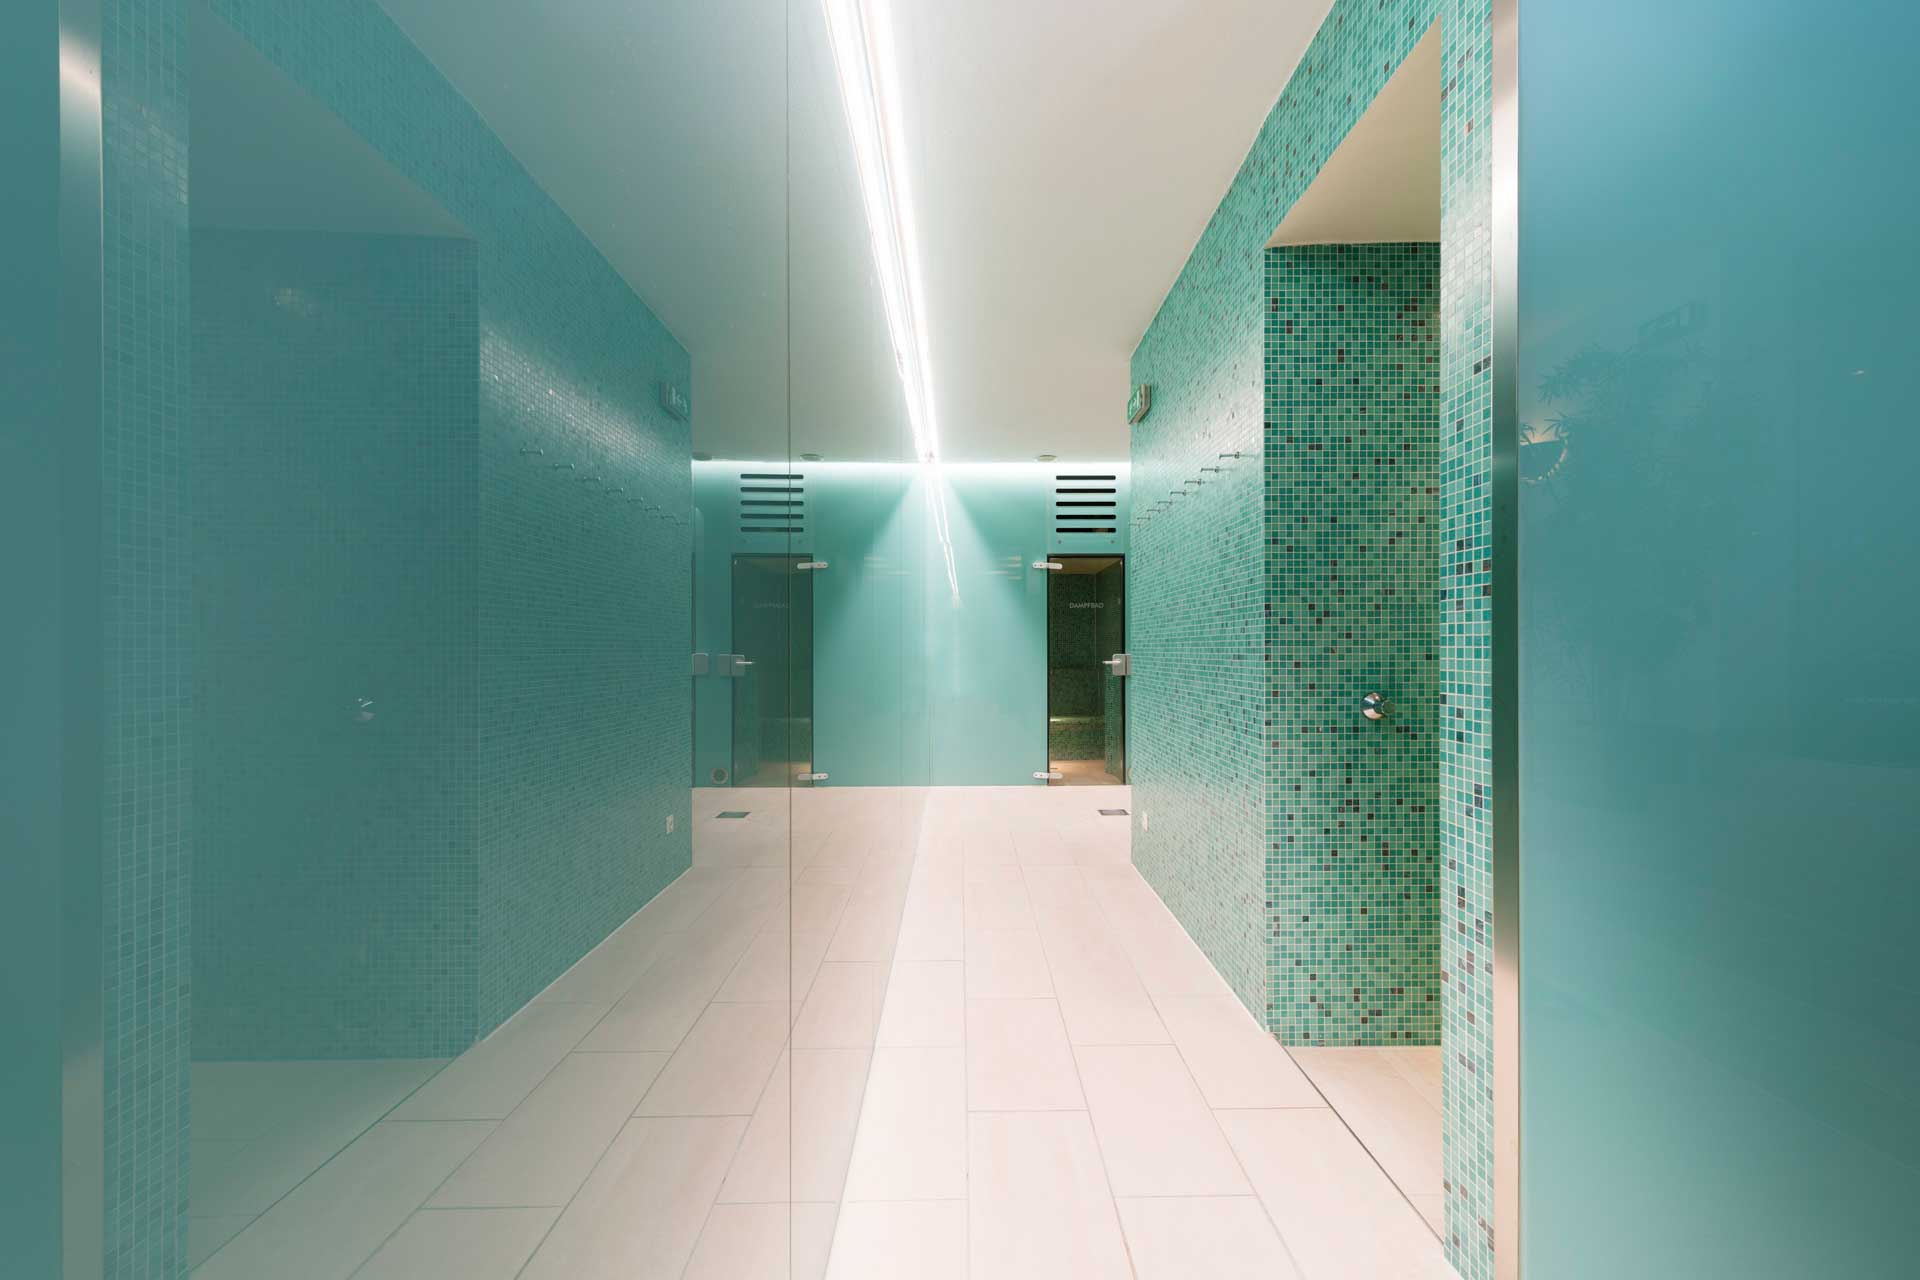 Hotel-Angelika-Galerie-Saunawelt